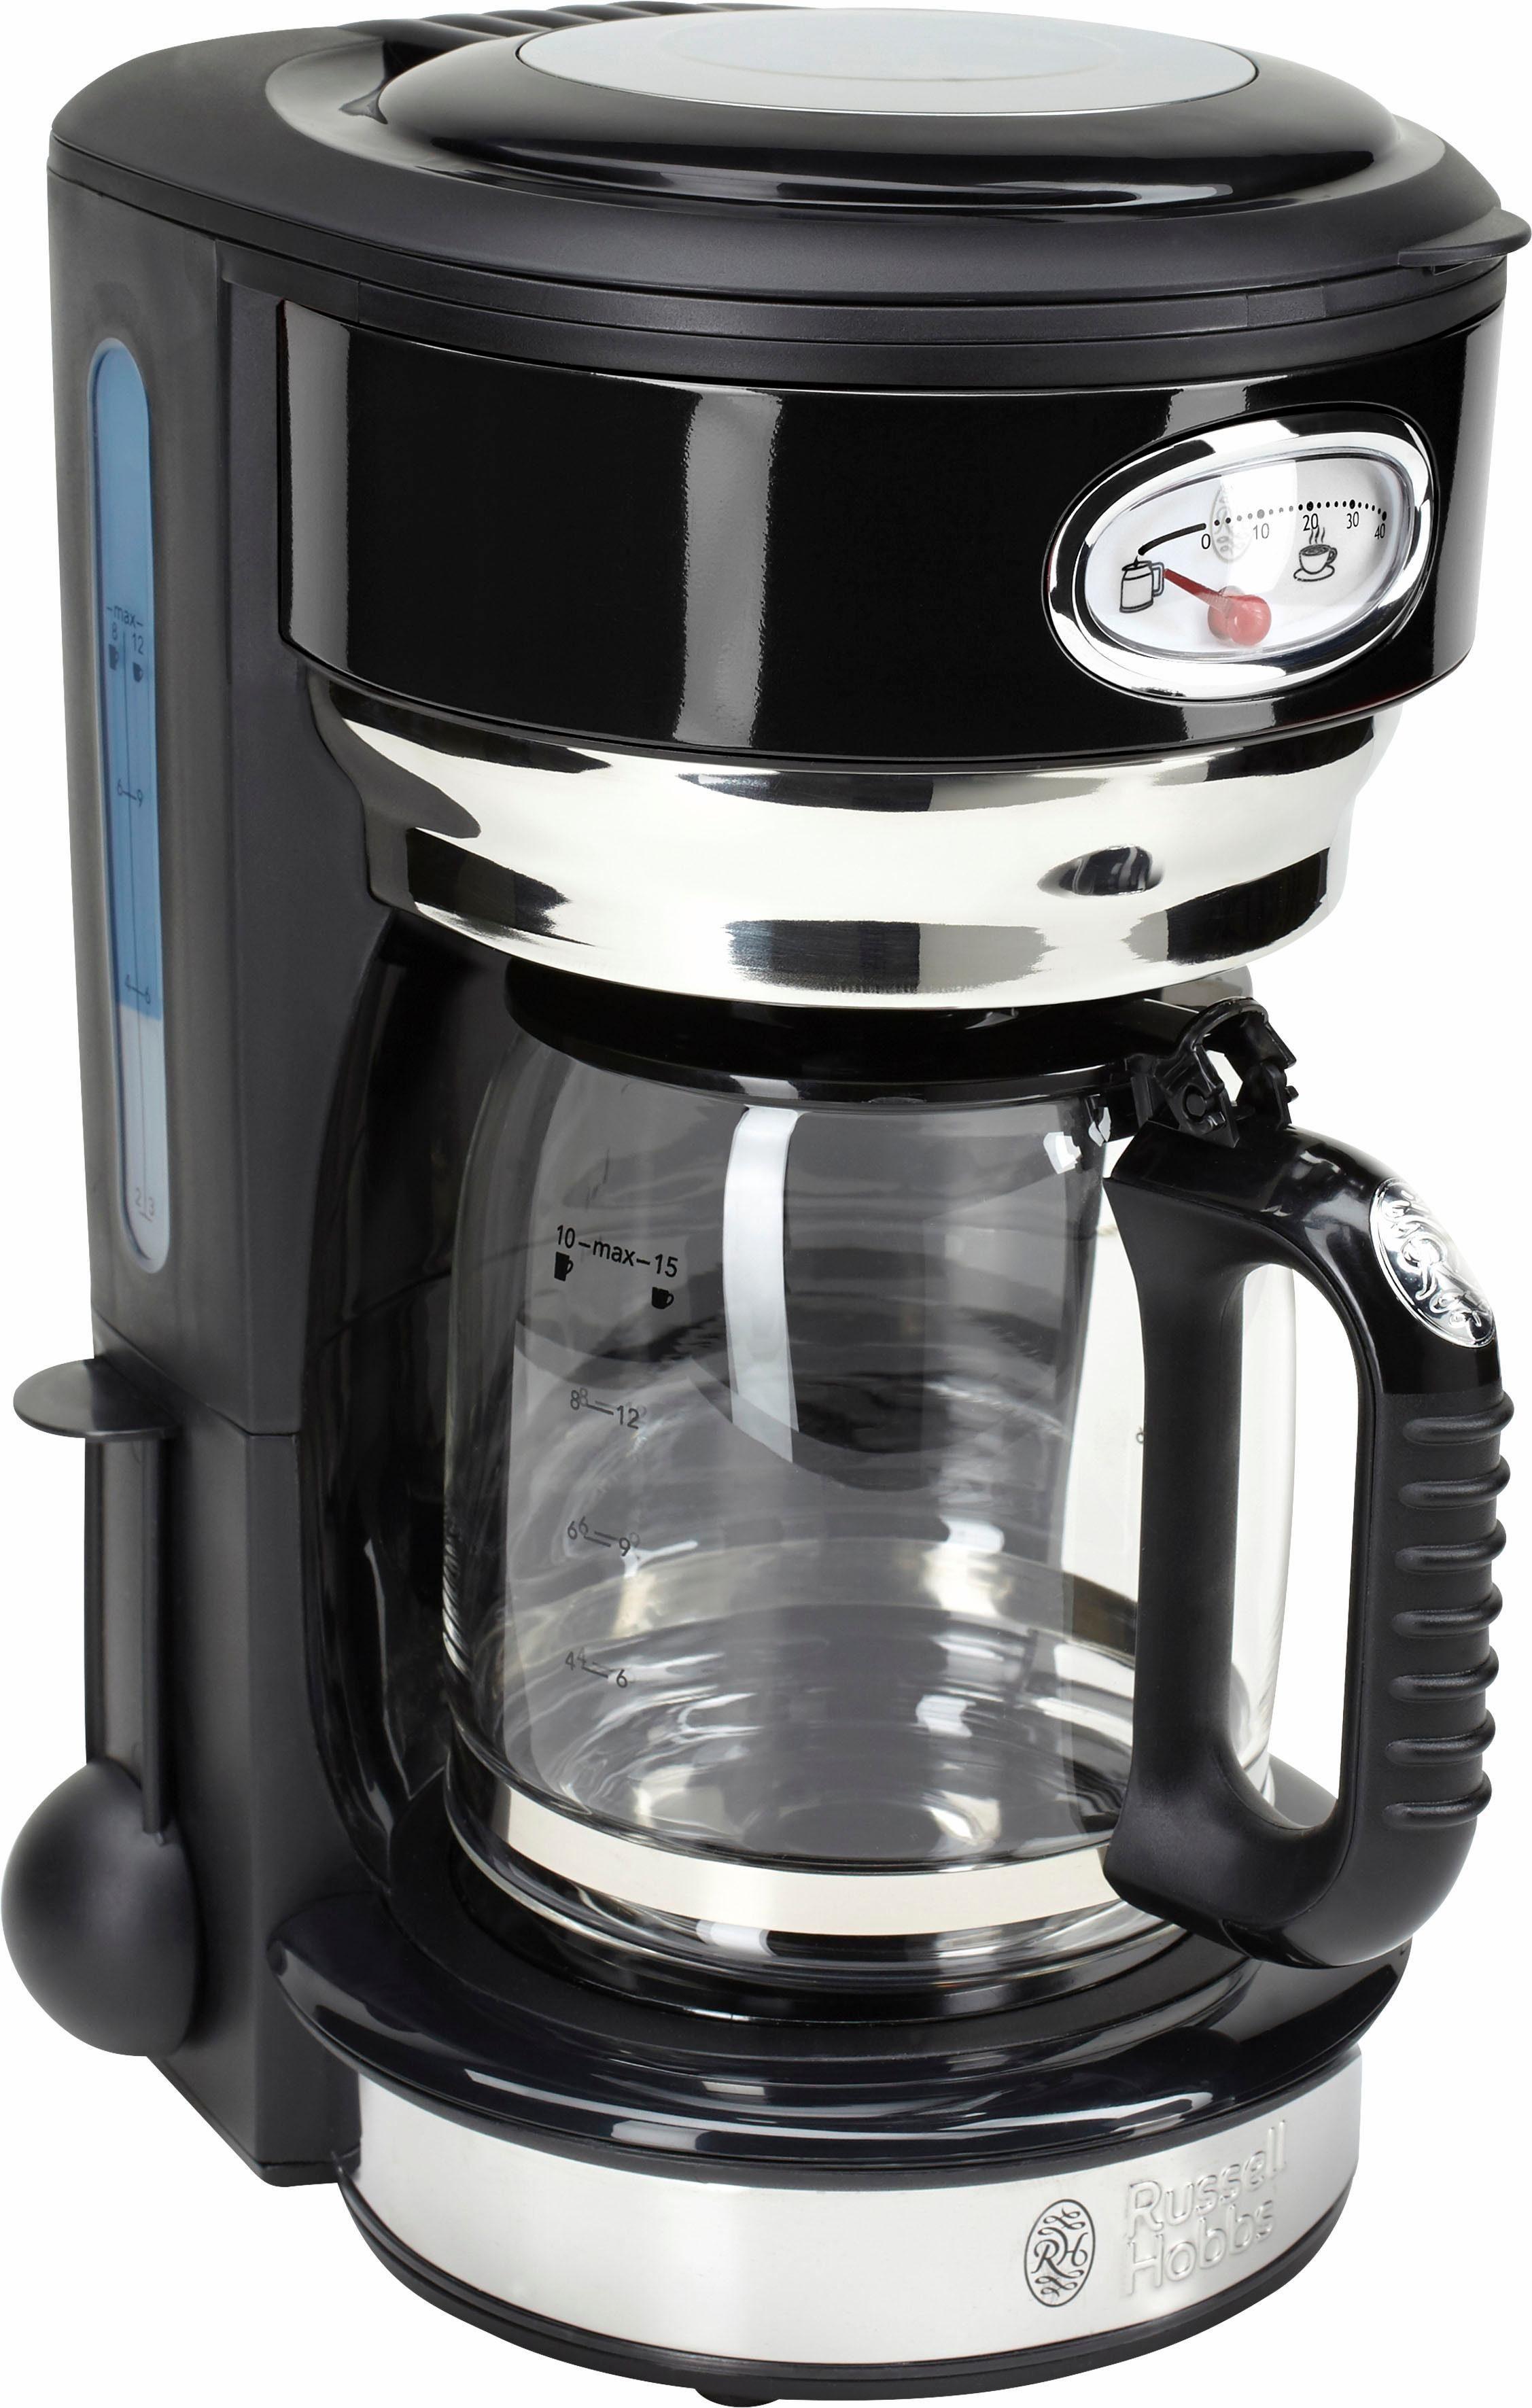 RUSSELL HOBBS Filterkaffeemaschine Retro 21701-56 Classic Noir, 1,25l Kaffeekanne, Papierfilter 1x4, mit Retro-Brühanzeige